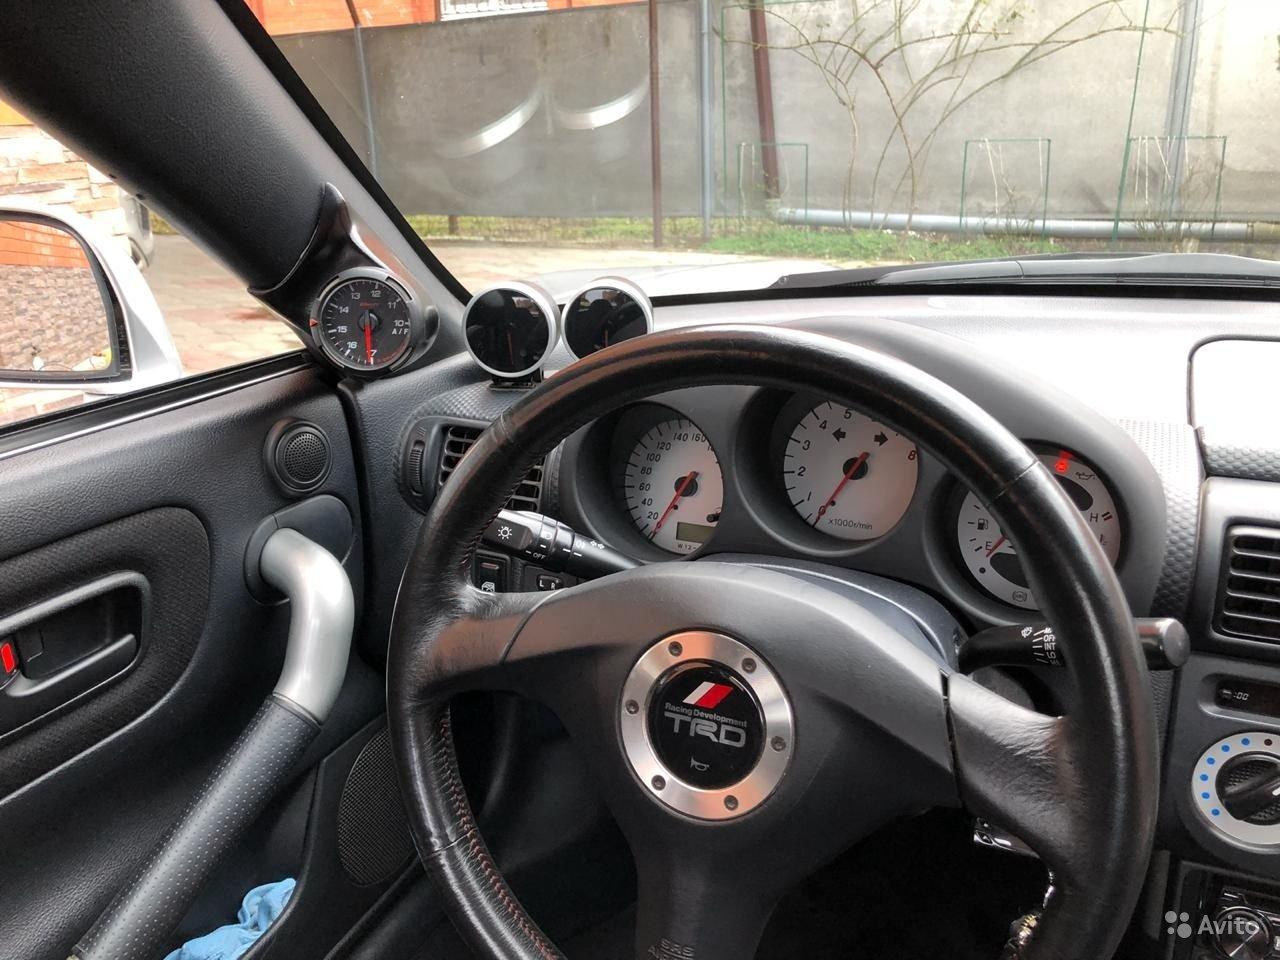 2001-Toyota-MR2-TTE-Turbo-9